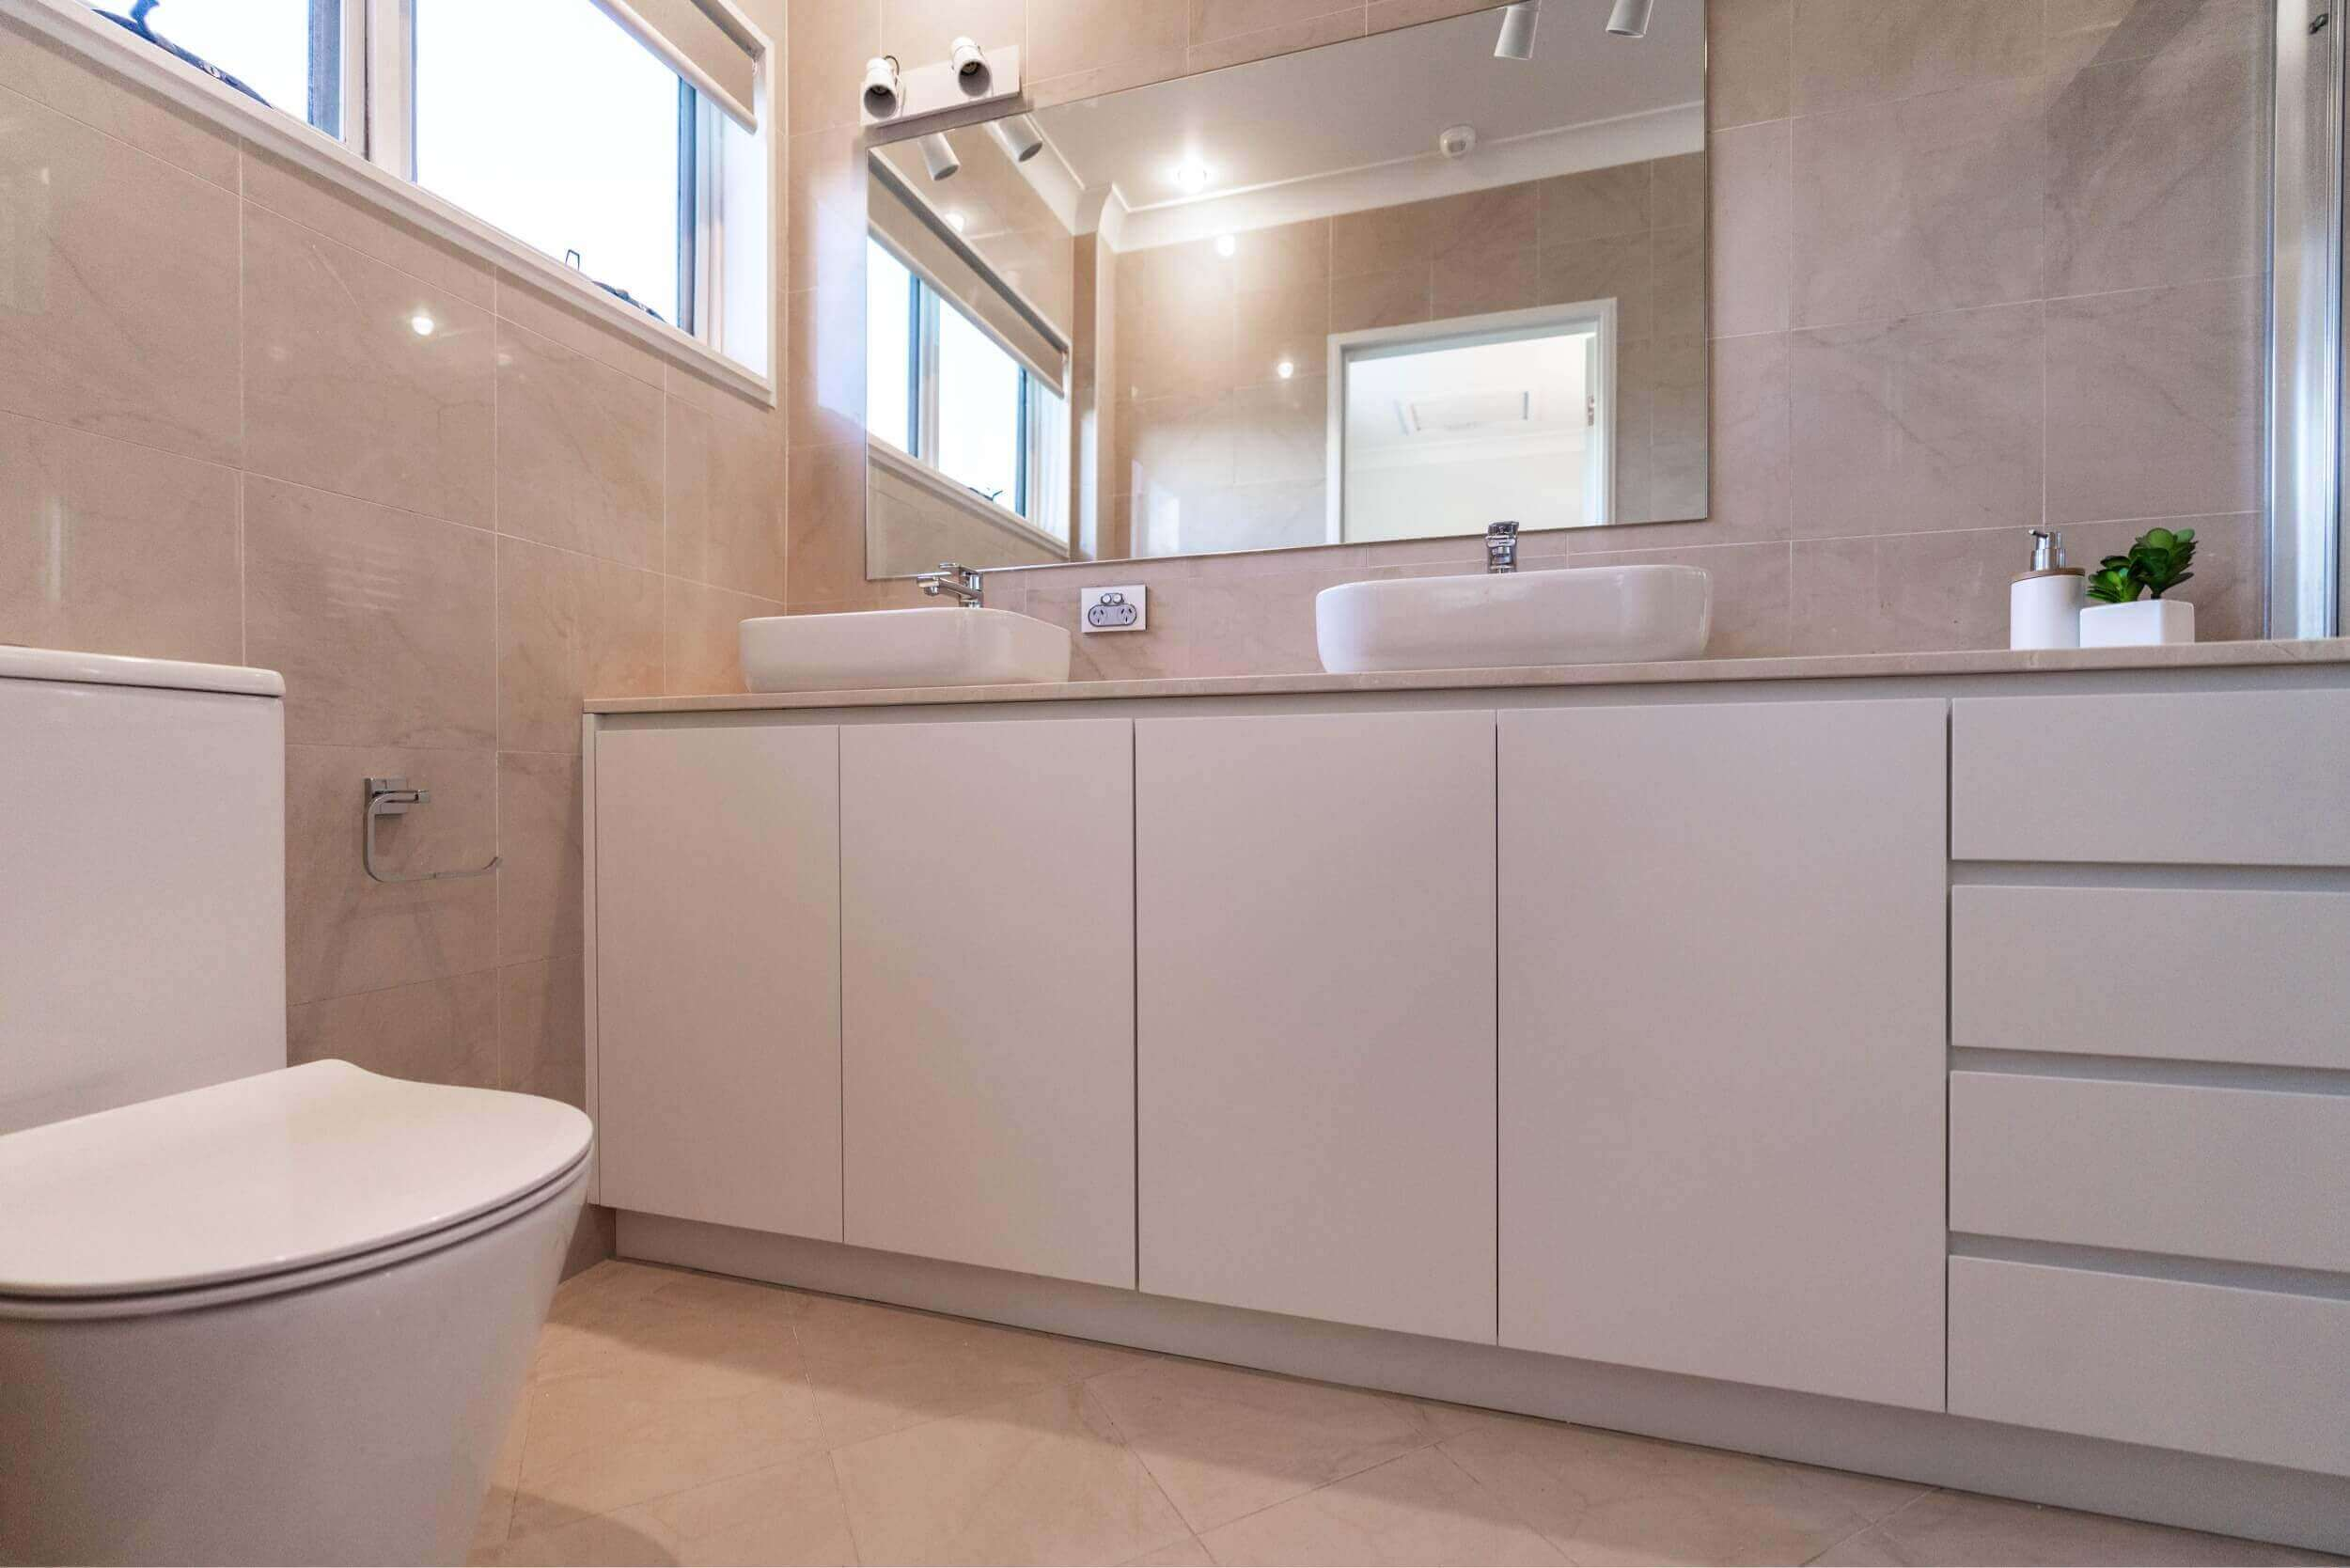 clinton built, home builder, residential builder, joinery, bathroom, sutherland shire builder, sydney builder